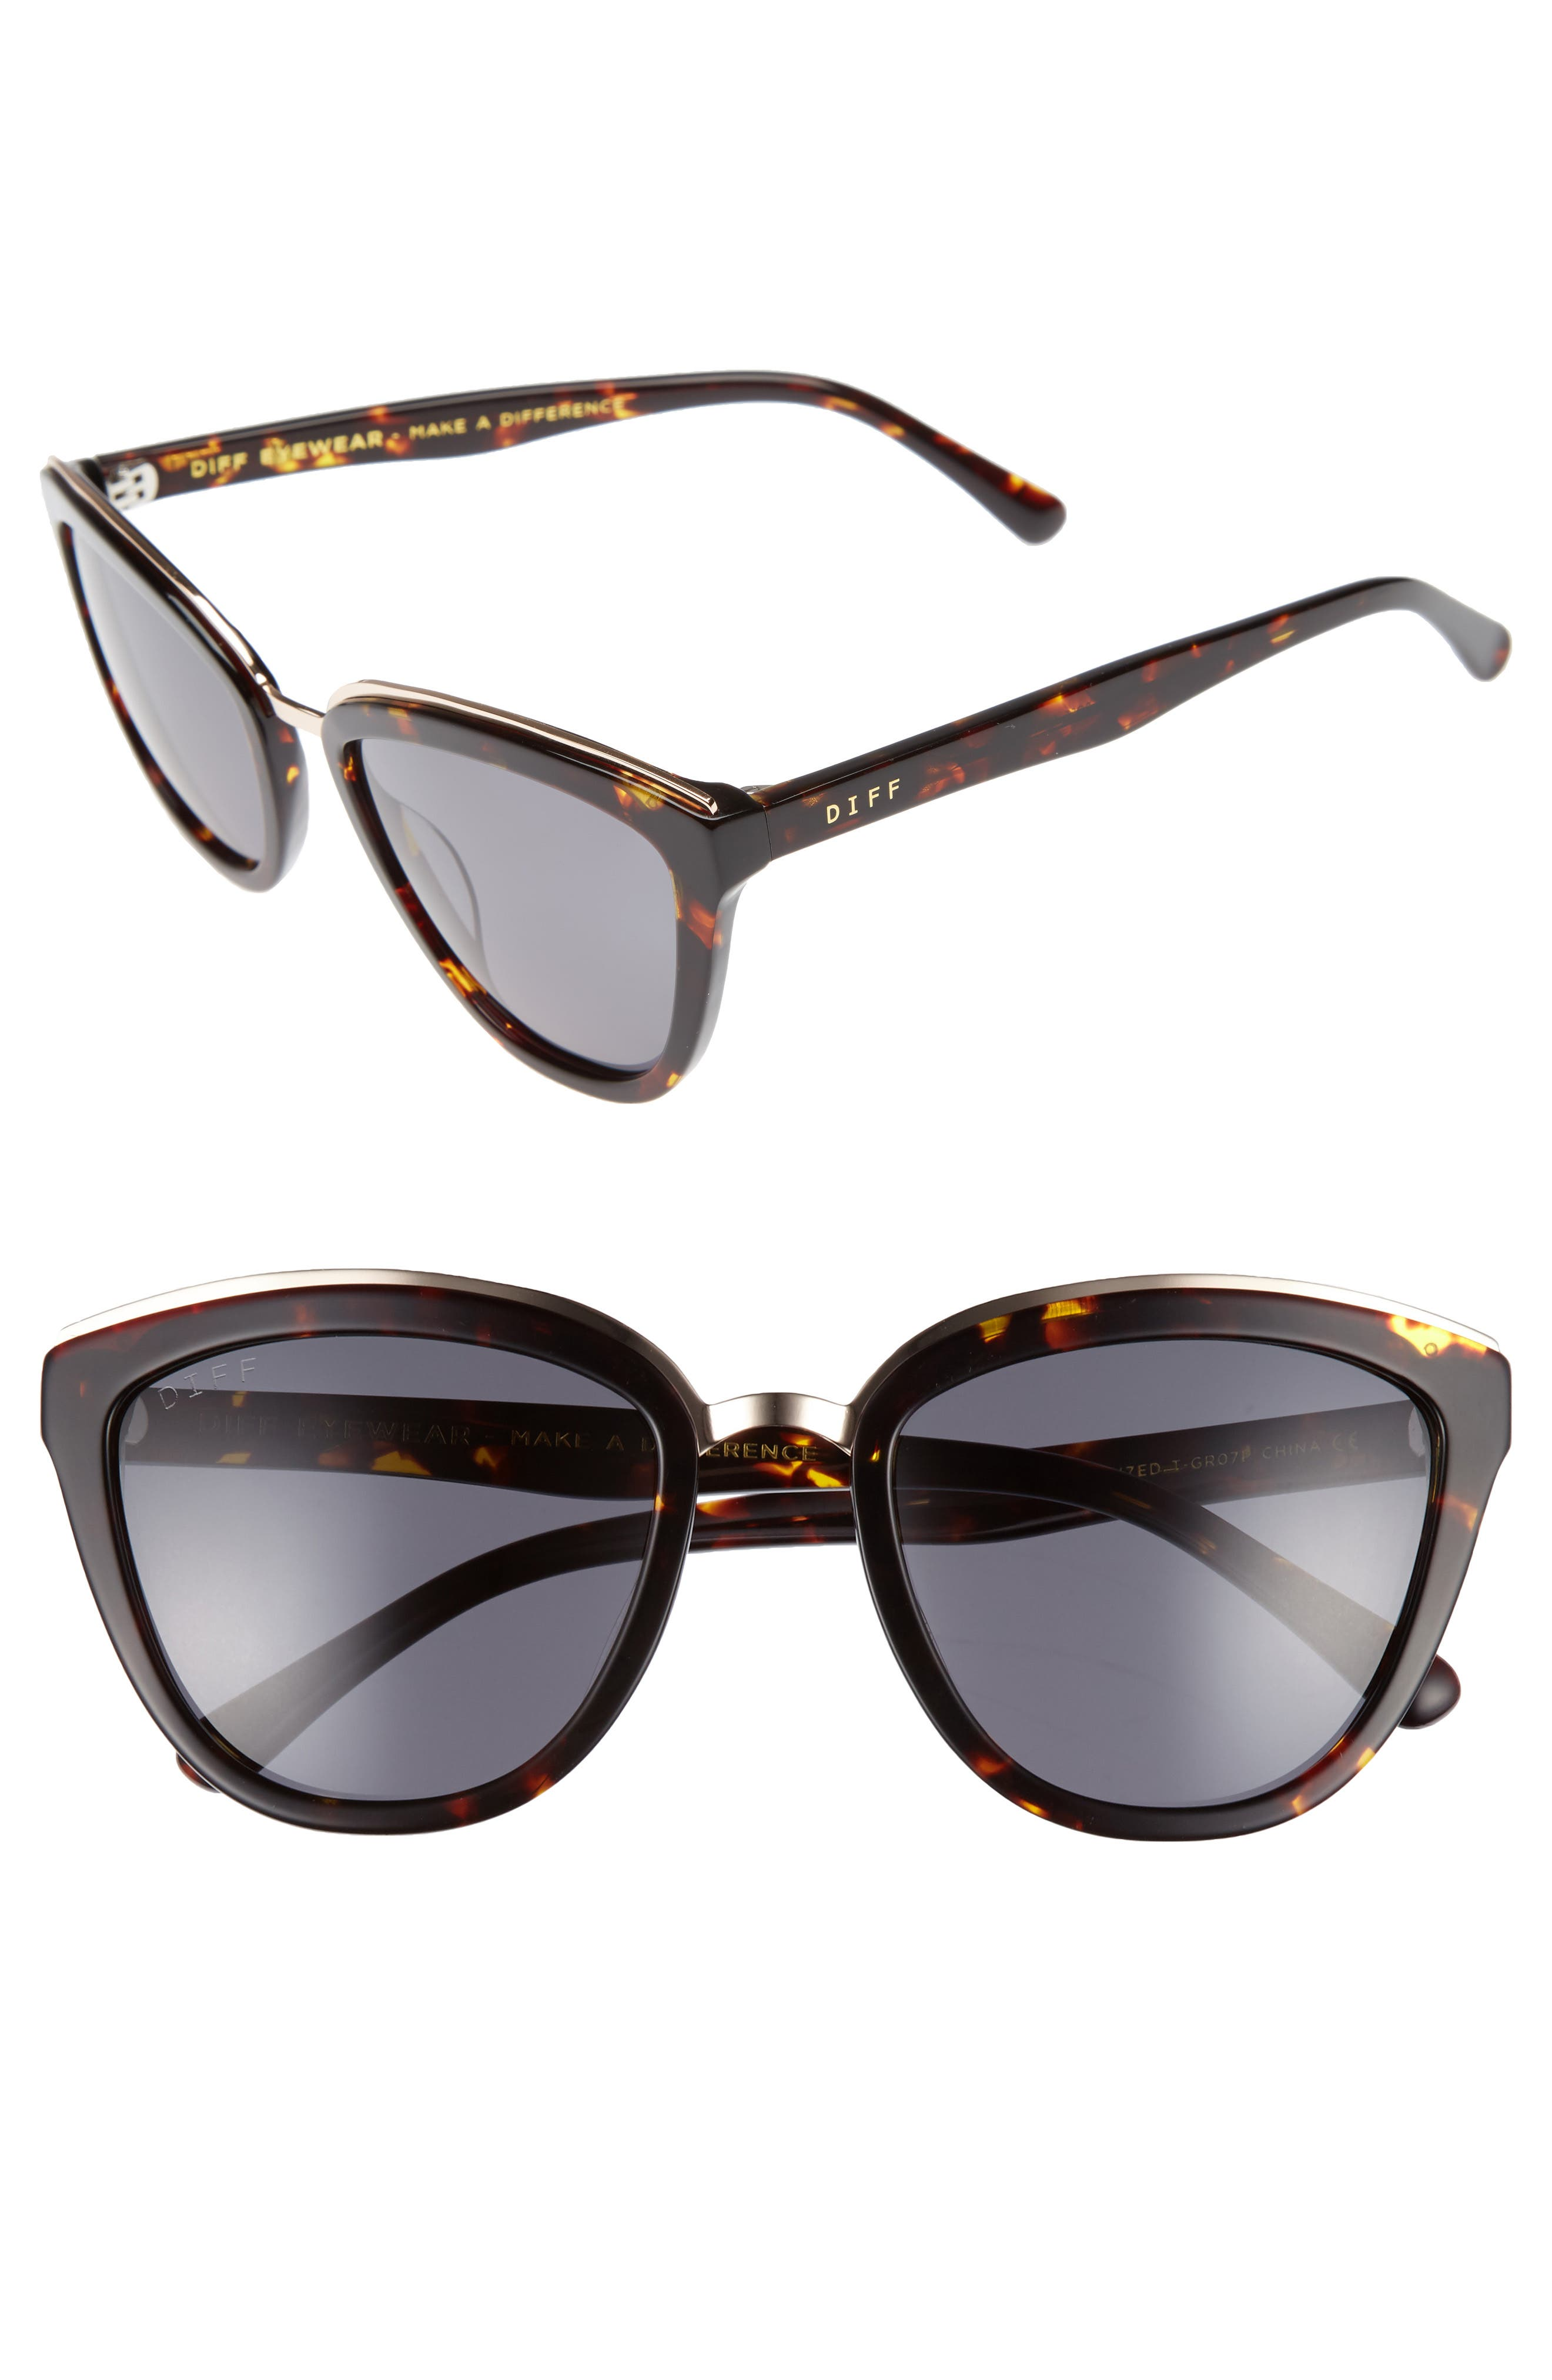 Rose 55mm Polarized Mirrored Sunglasses,                         Main,                         color, Tortoise/ Grey